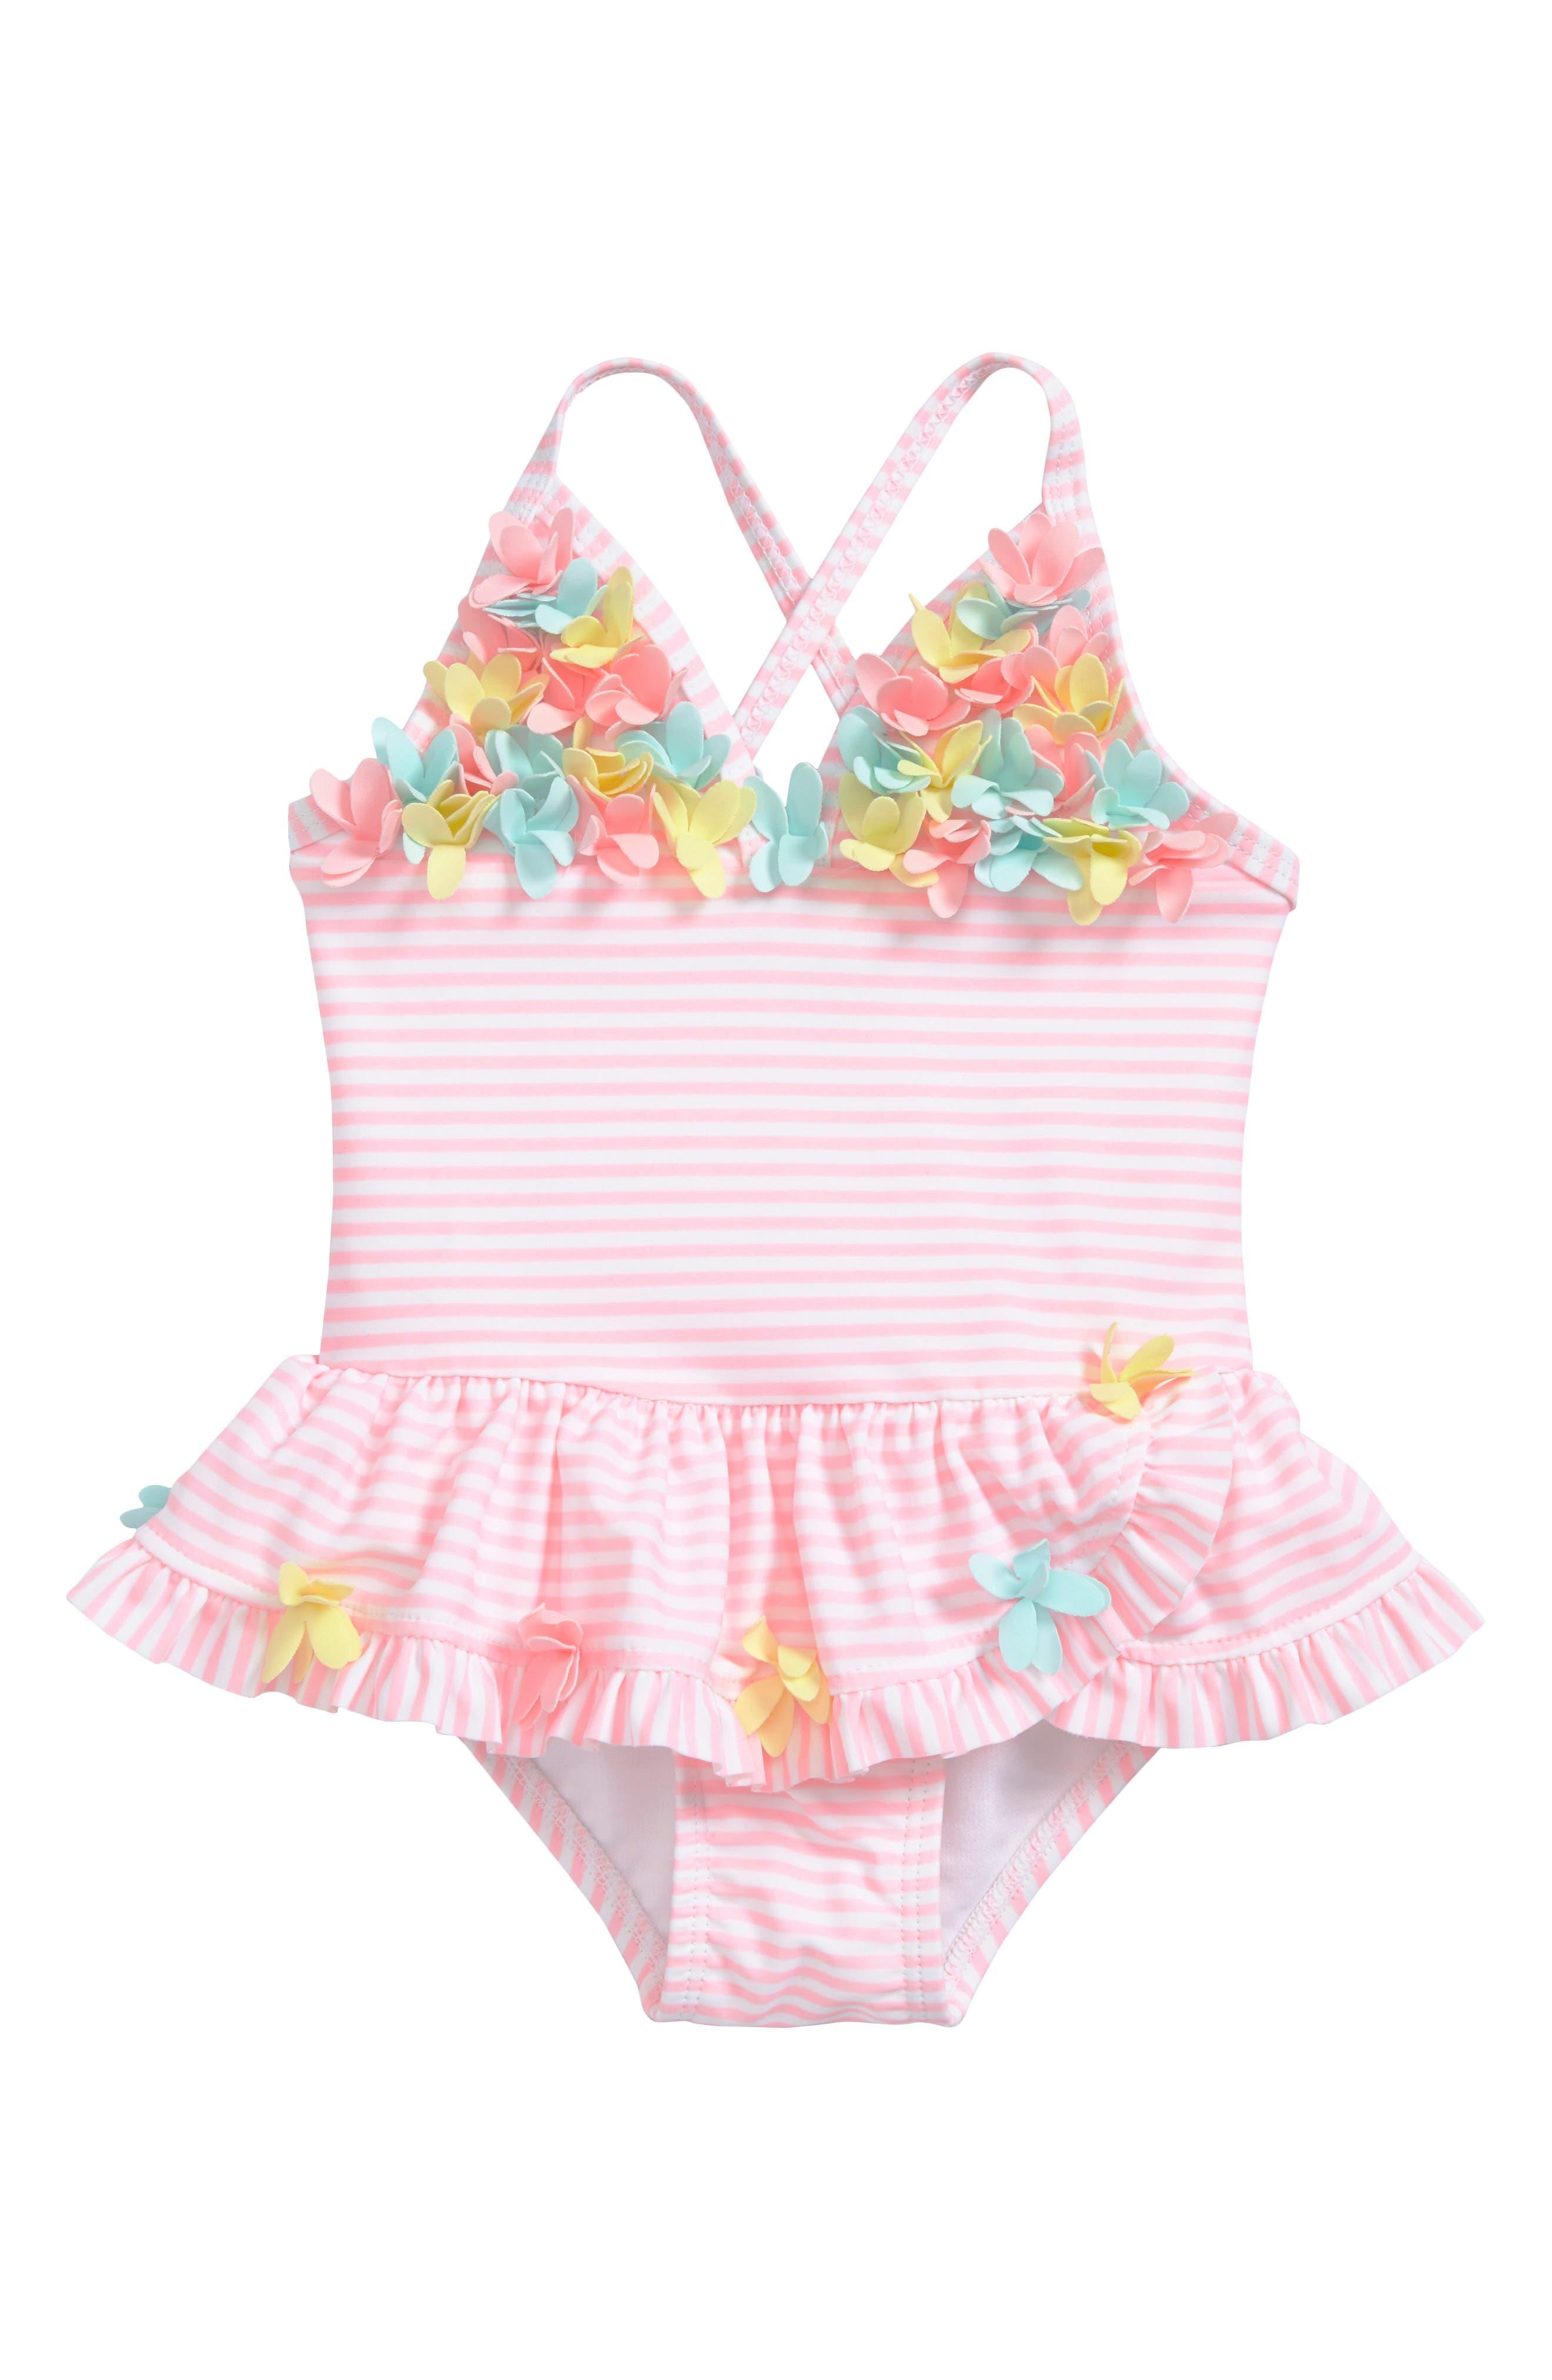 Flower Appliqué Skirted One-Piece Swimsuit,                             Main thumbnail 1, color,                             684